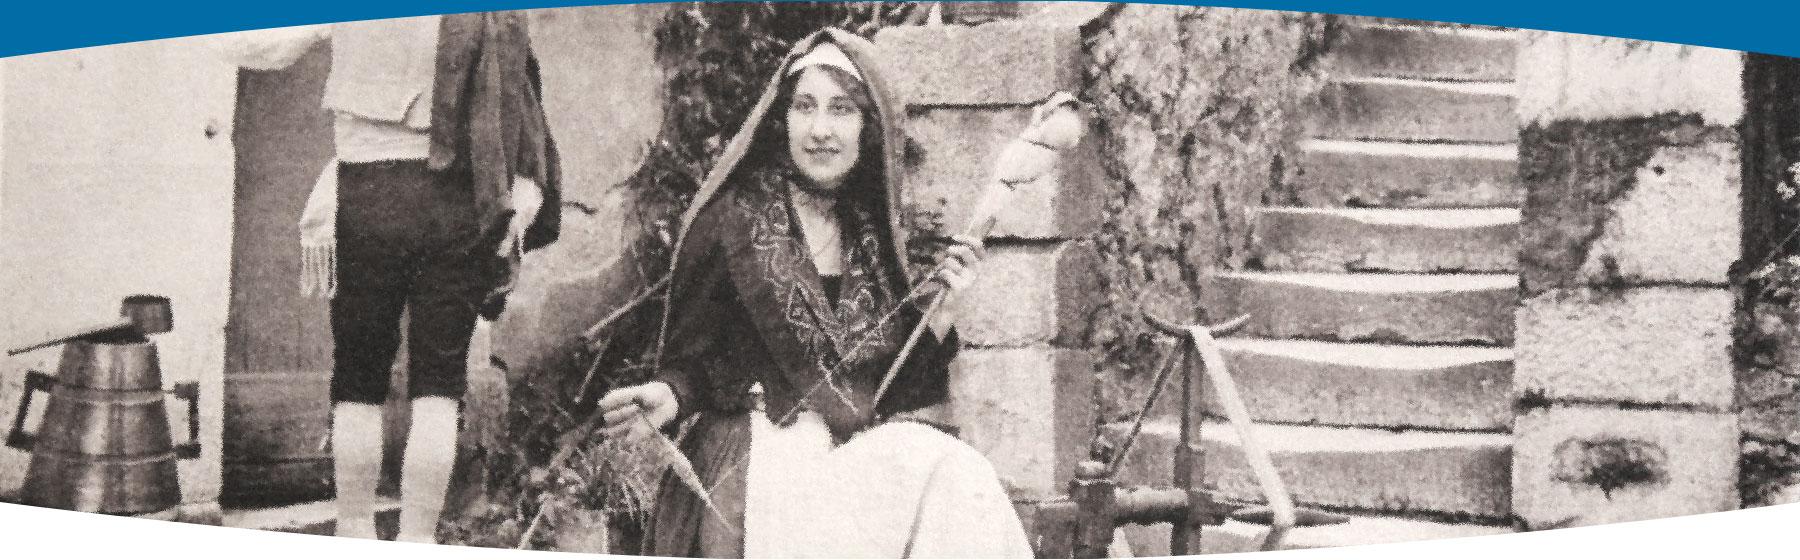 Cartes postales anciennes de Laruns